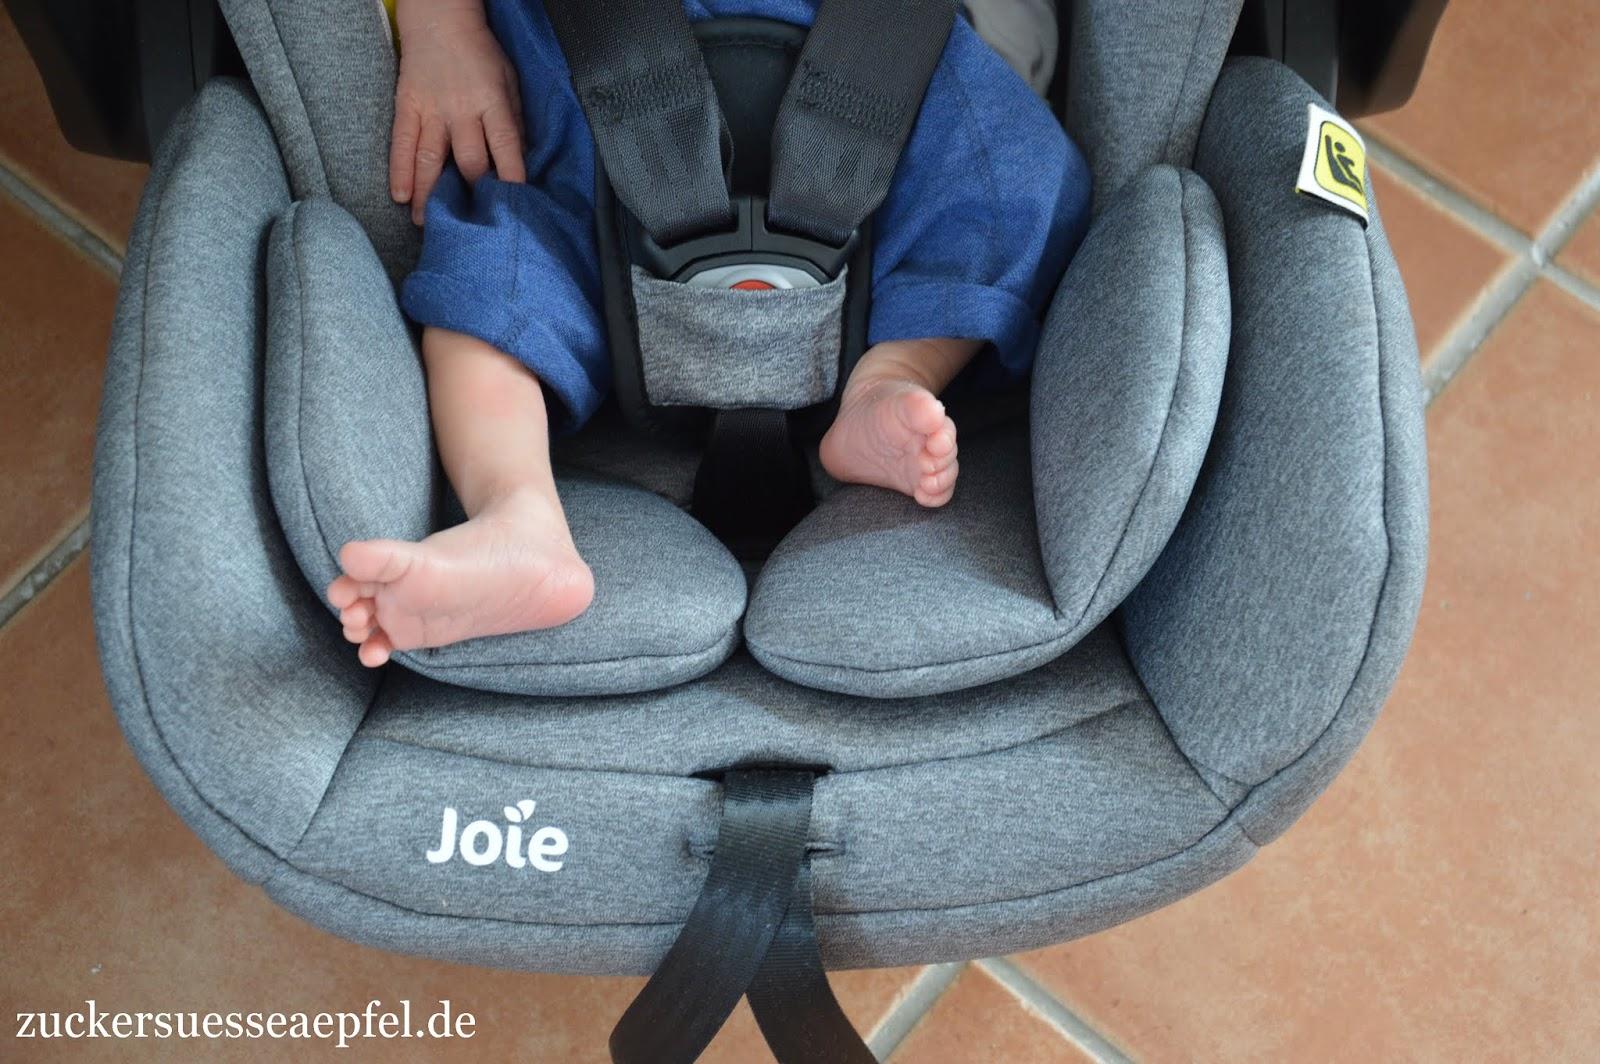 joie babyschale i level